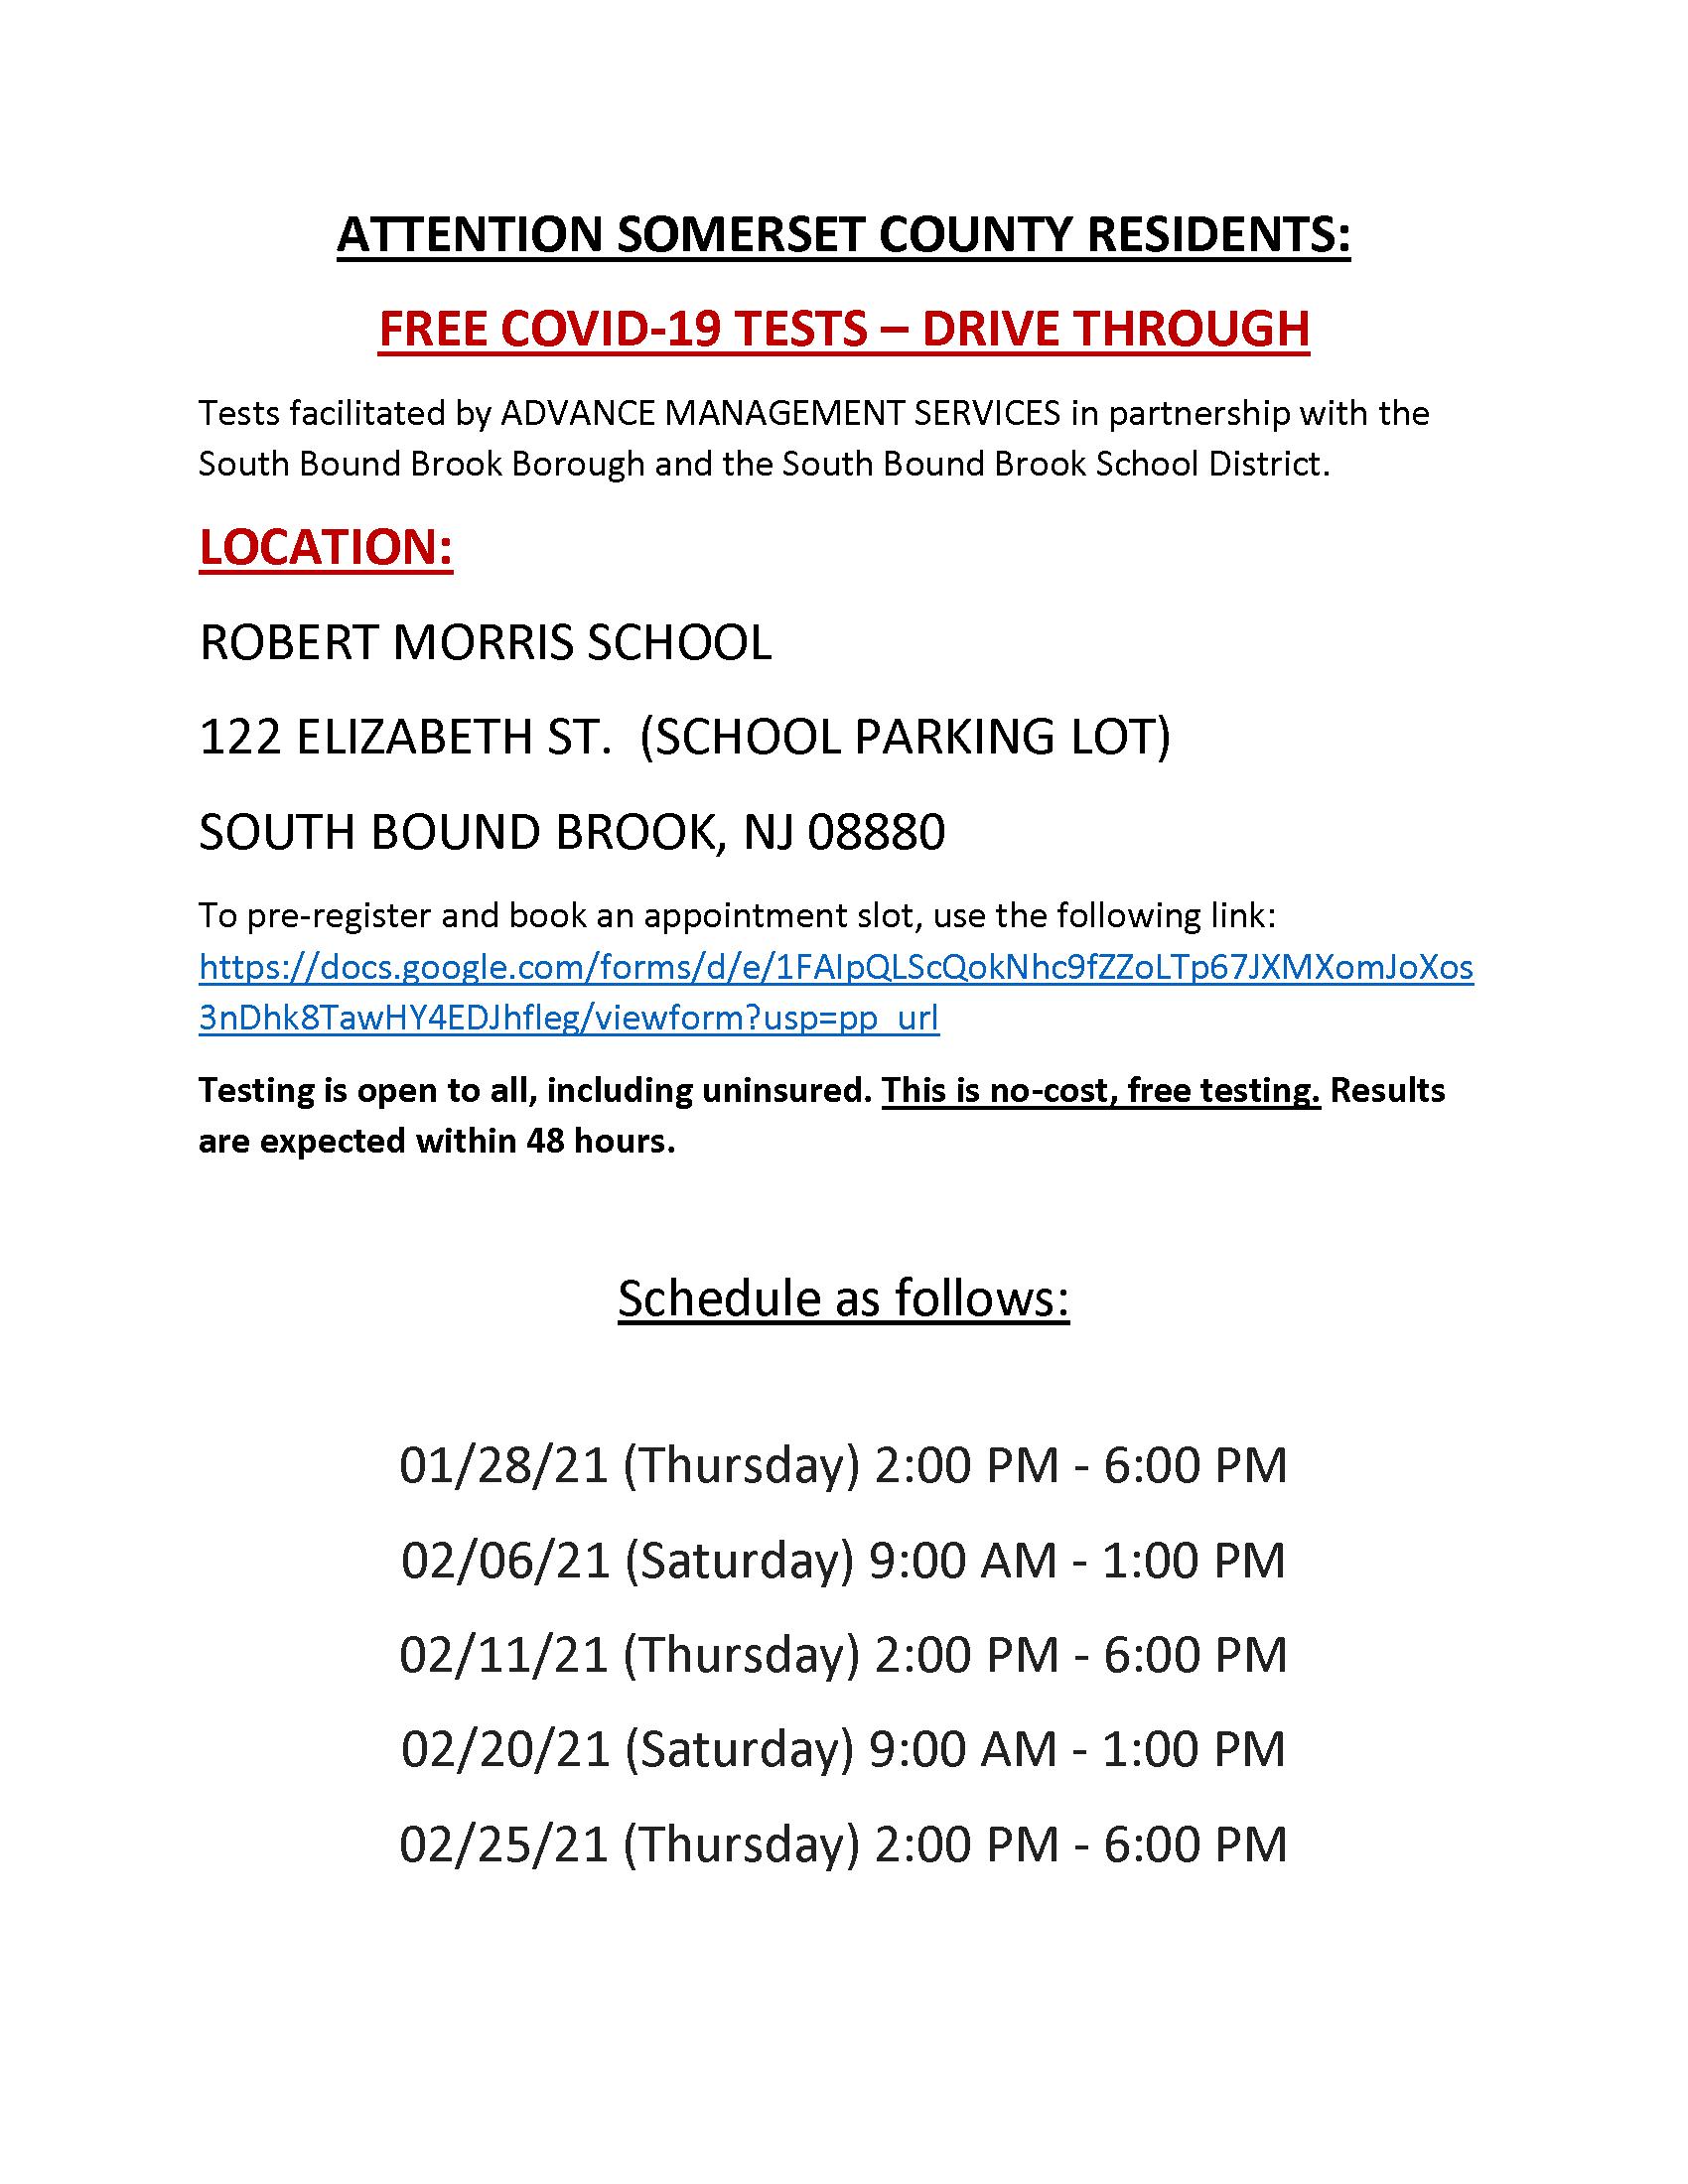 SBB COVID 19 Testing Announcement English PNG